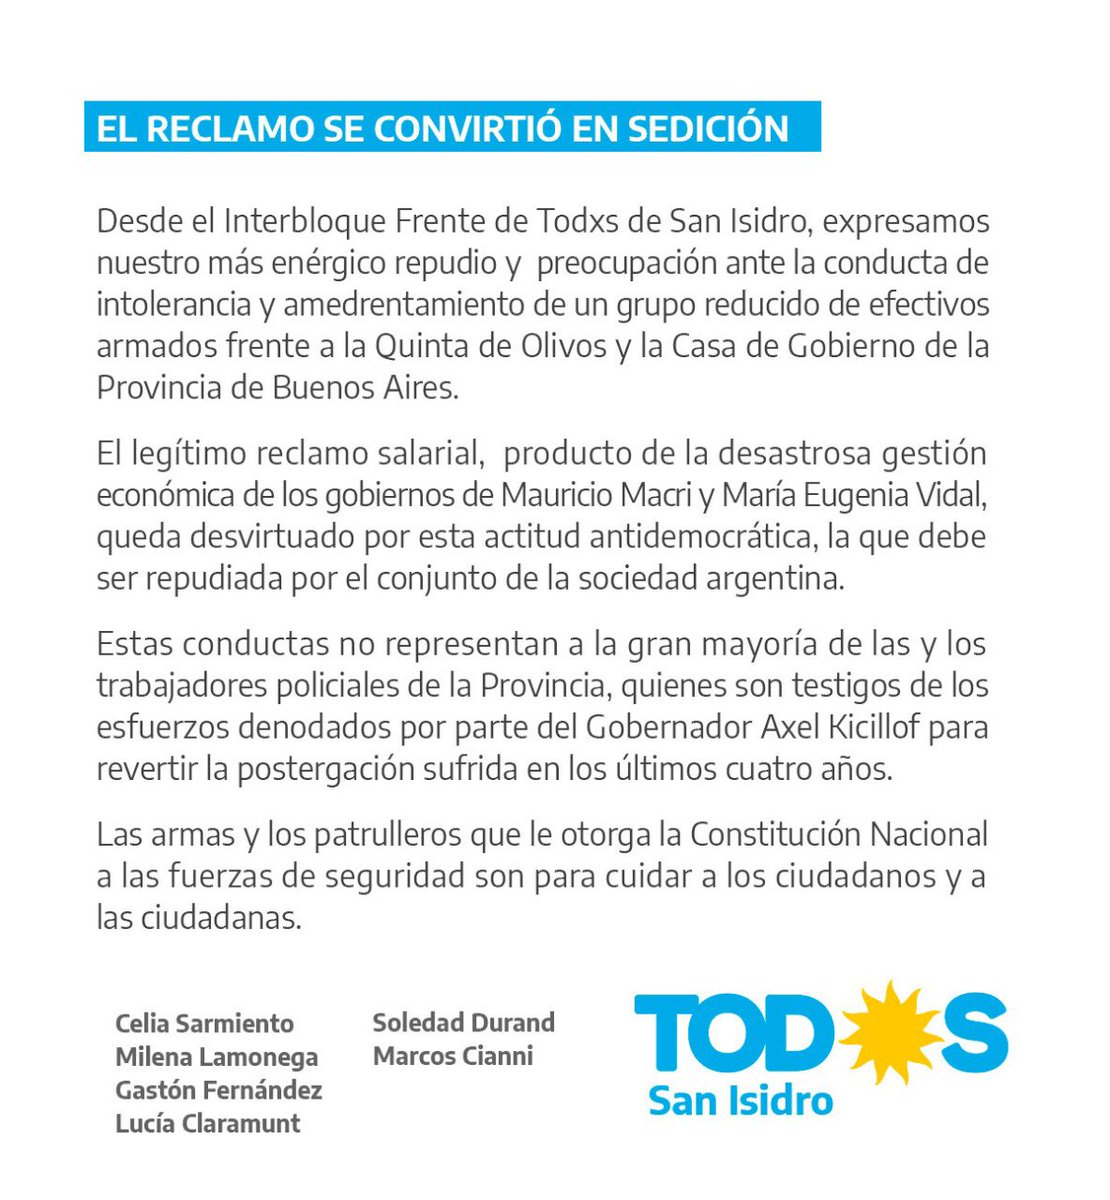 Comunicado del interbloque @FrenteDeTodos en #SanIsidro https://t.co/Em8USOI7YJ